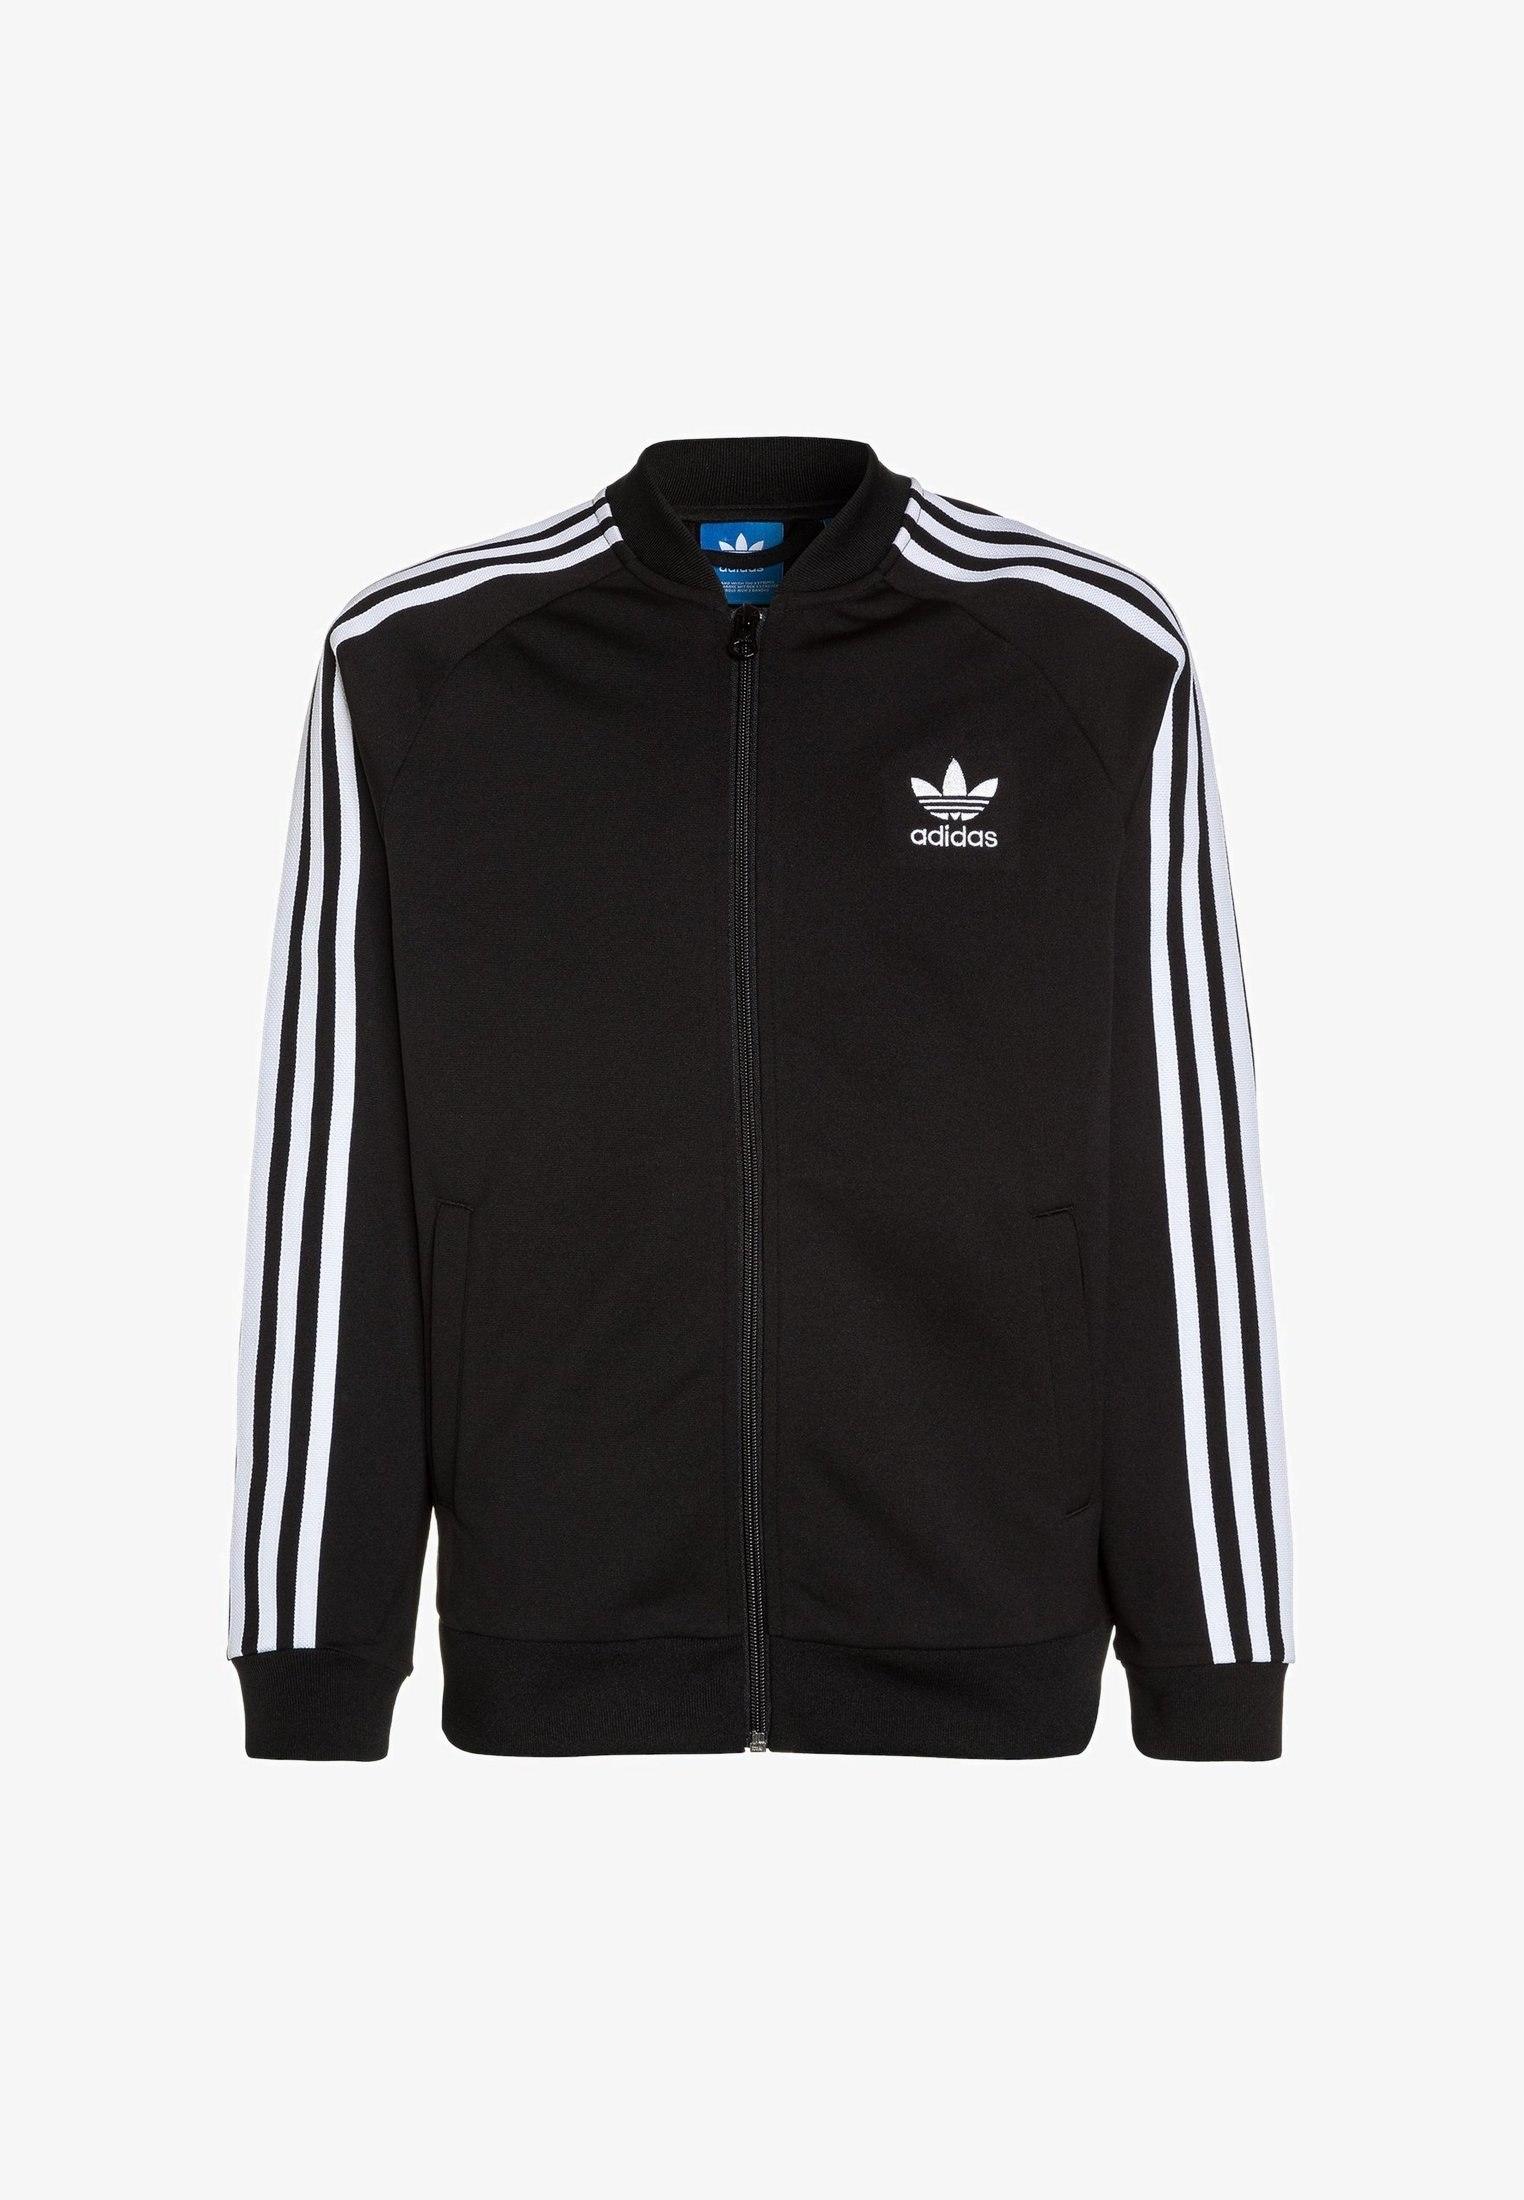 Kurtka Adidas ORIGINALS PONCHO WINDBREAKER CE2477